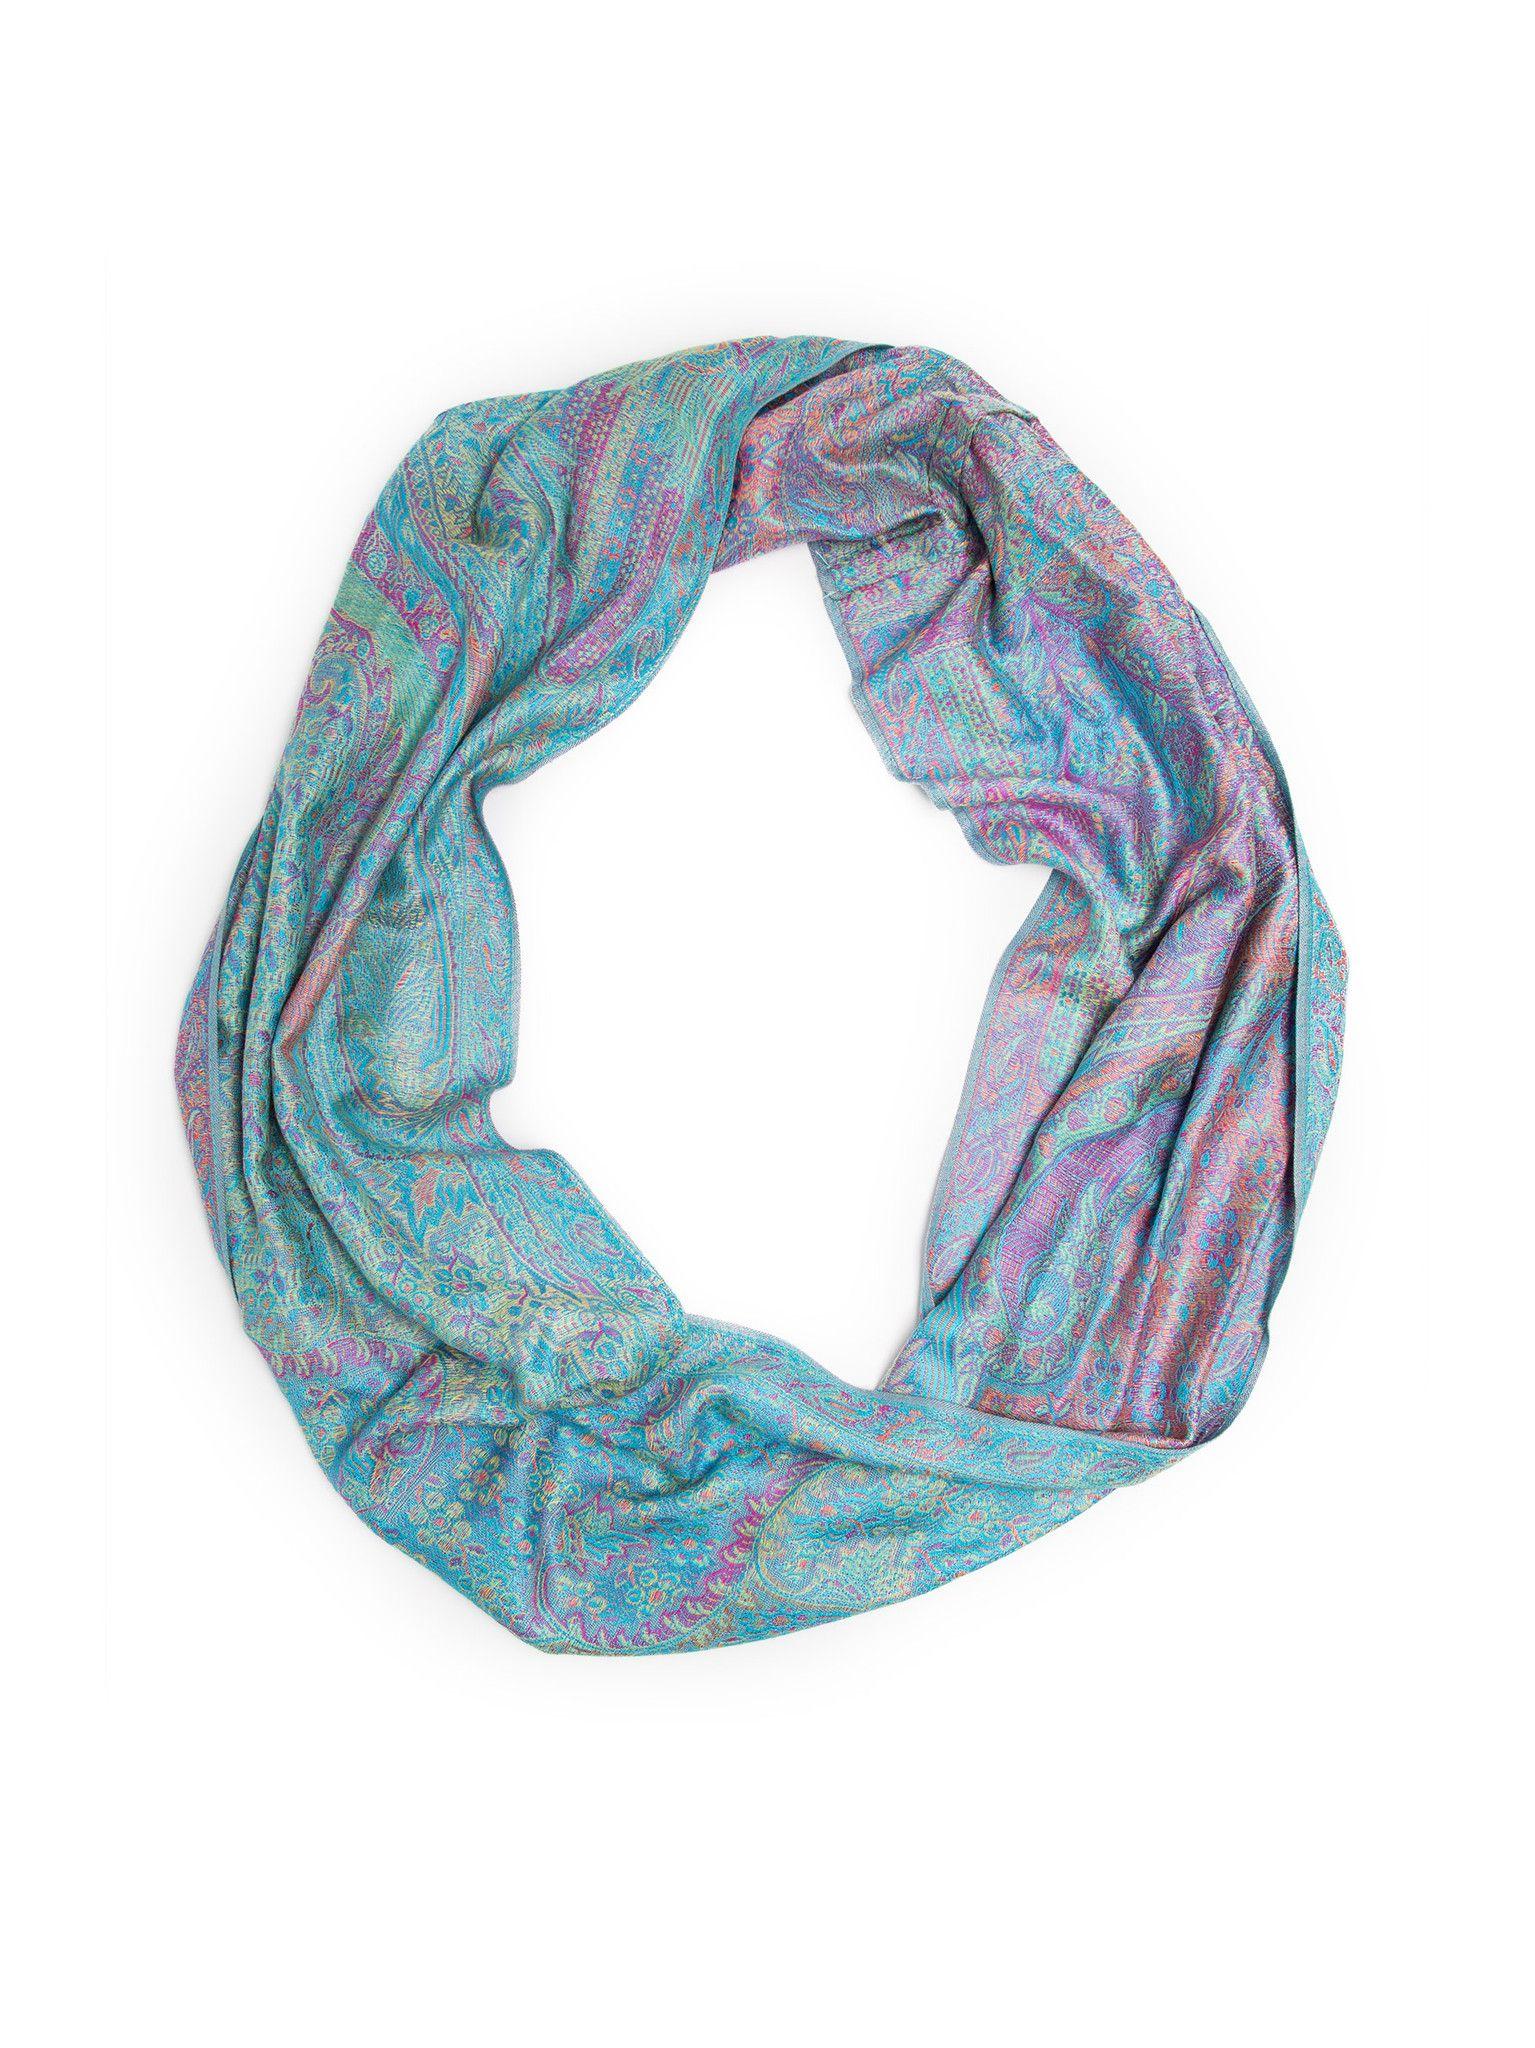 0c3934d74 Rajana Infinity Scarf, Richly Colored Rare Pashmina Infinity ...